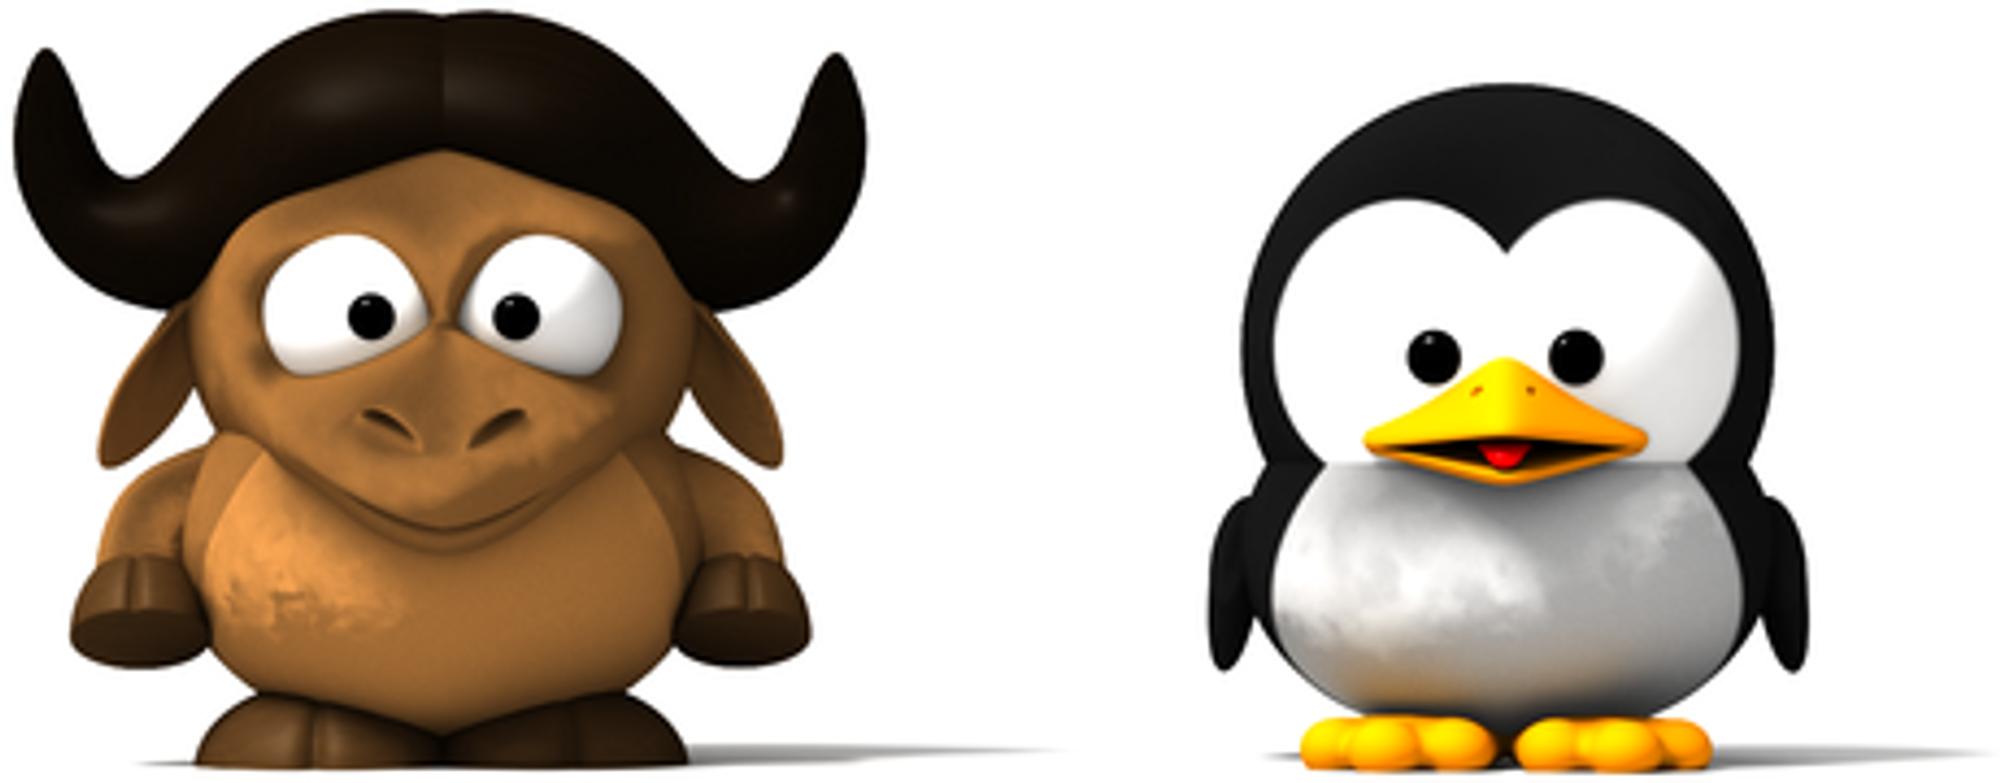 GNU/Linux er den korrekte betegnelsen...